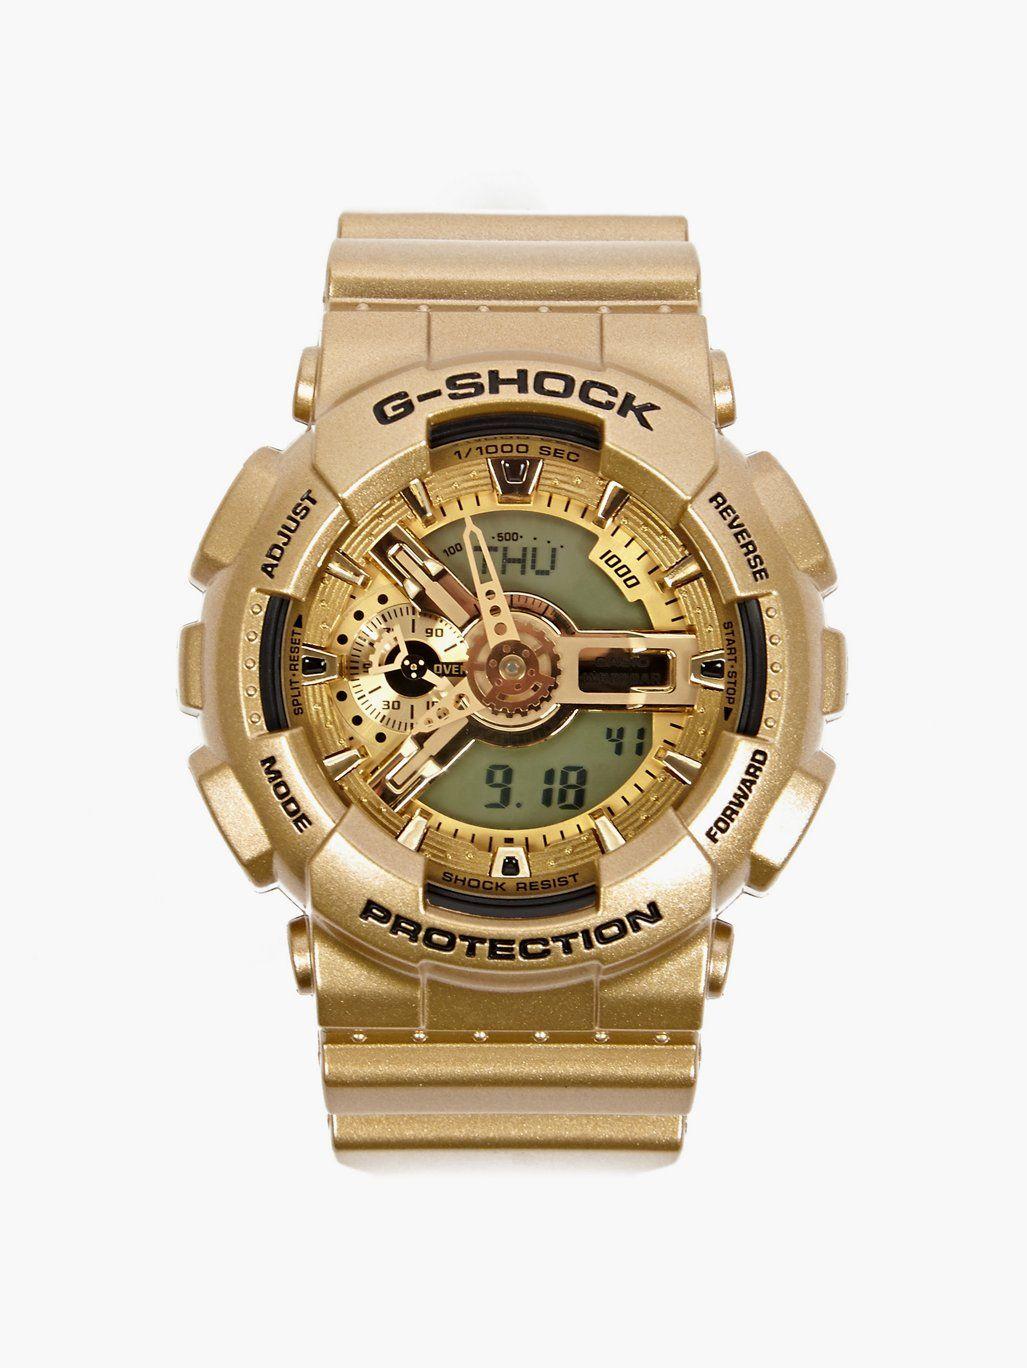 Casio G Shock Mens Gold Ga 110gd 9aer Watch Oki Ni Watches Gshock Original Gd 100ms 3er Limited Colorway